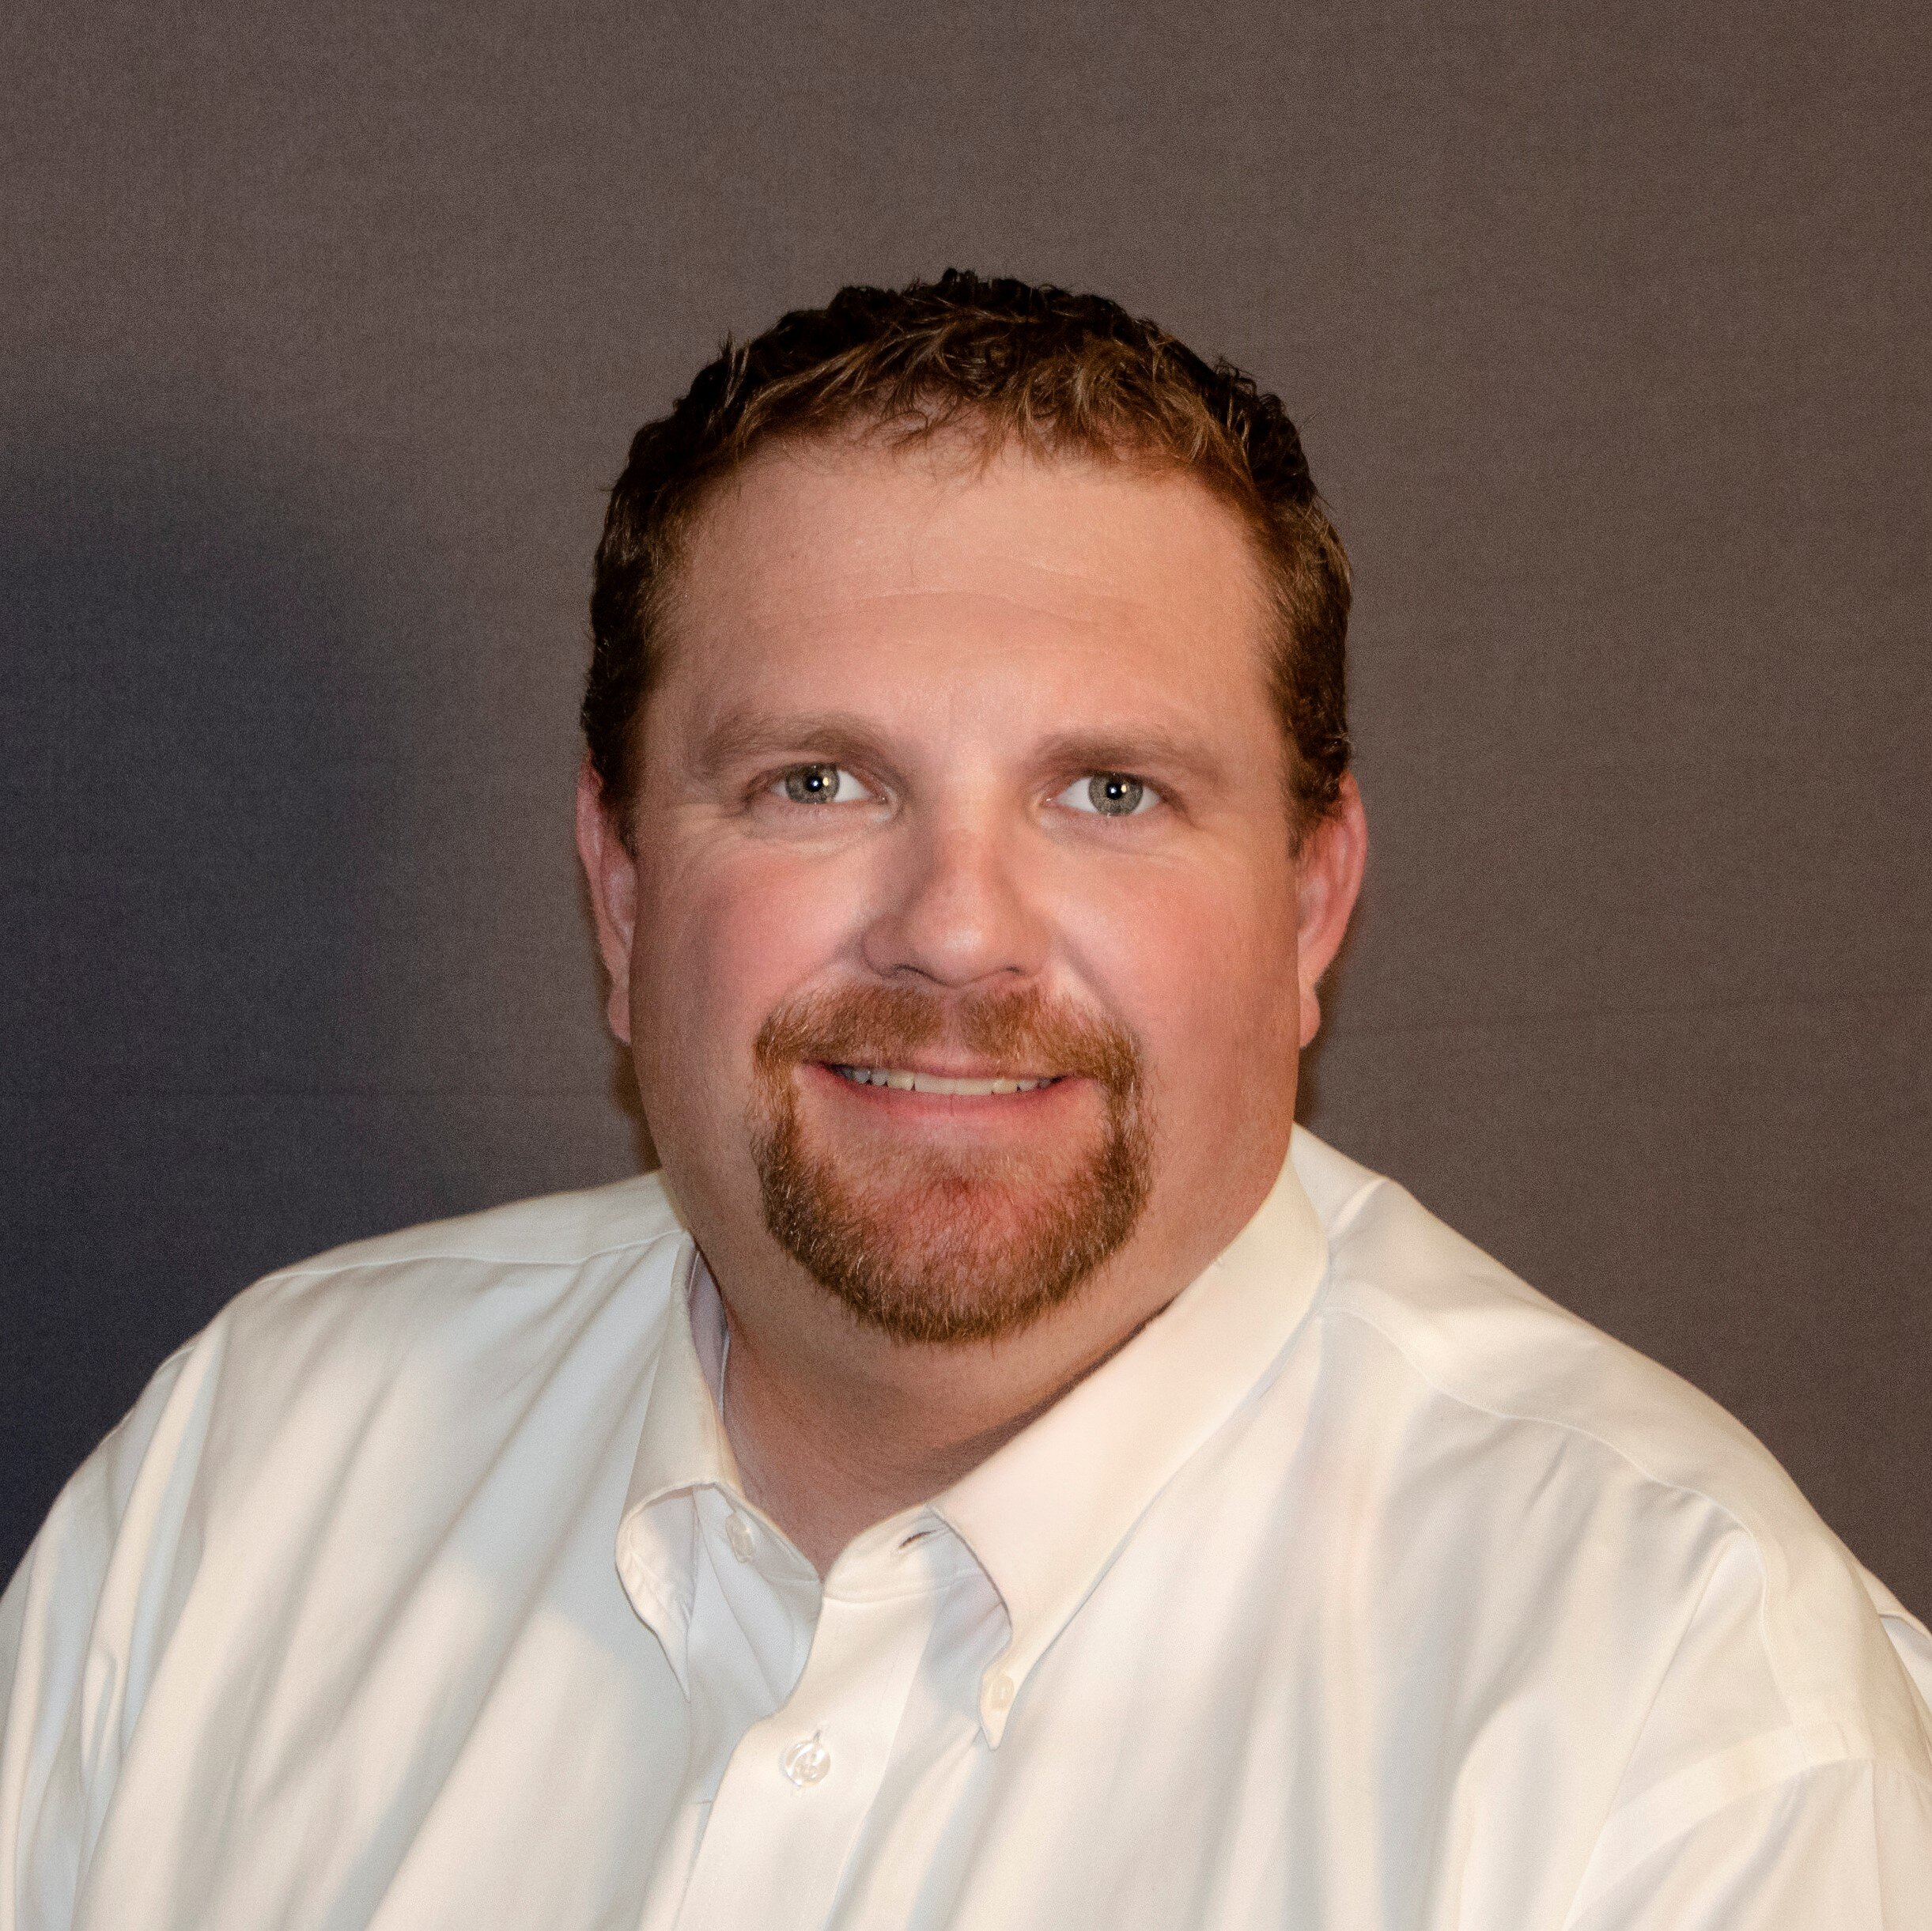 Robert Glance, BuildingFit President